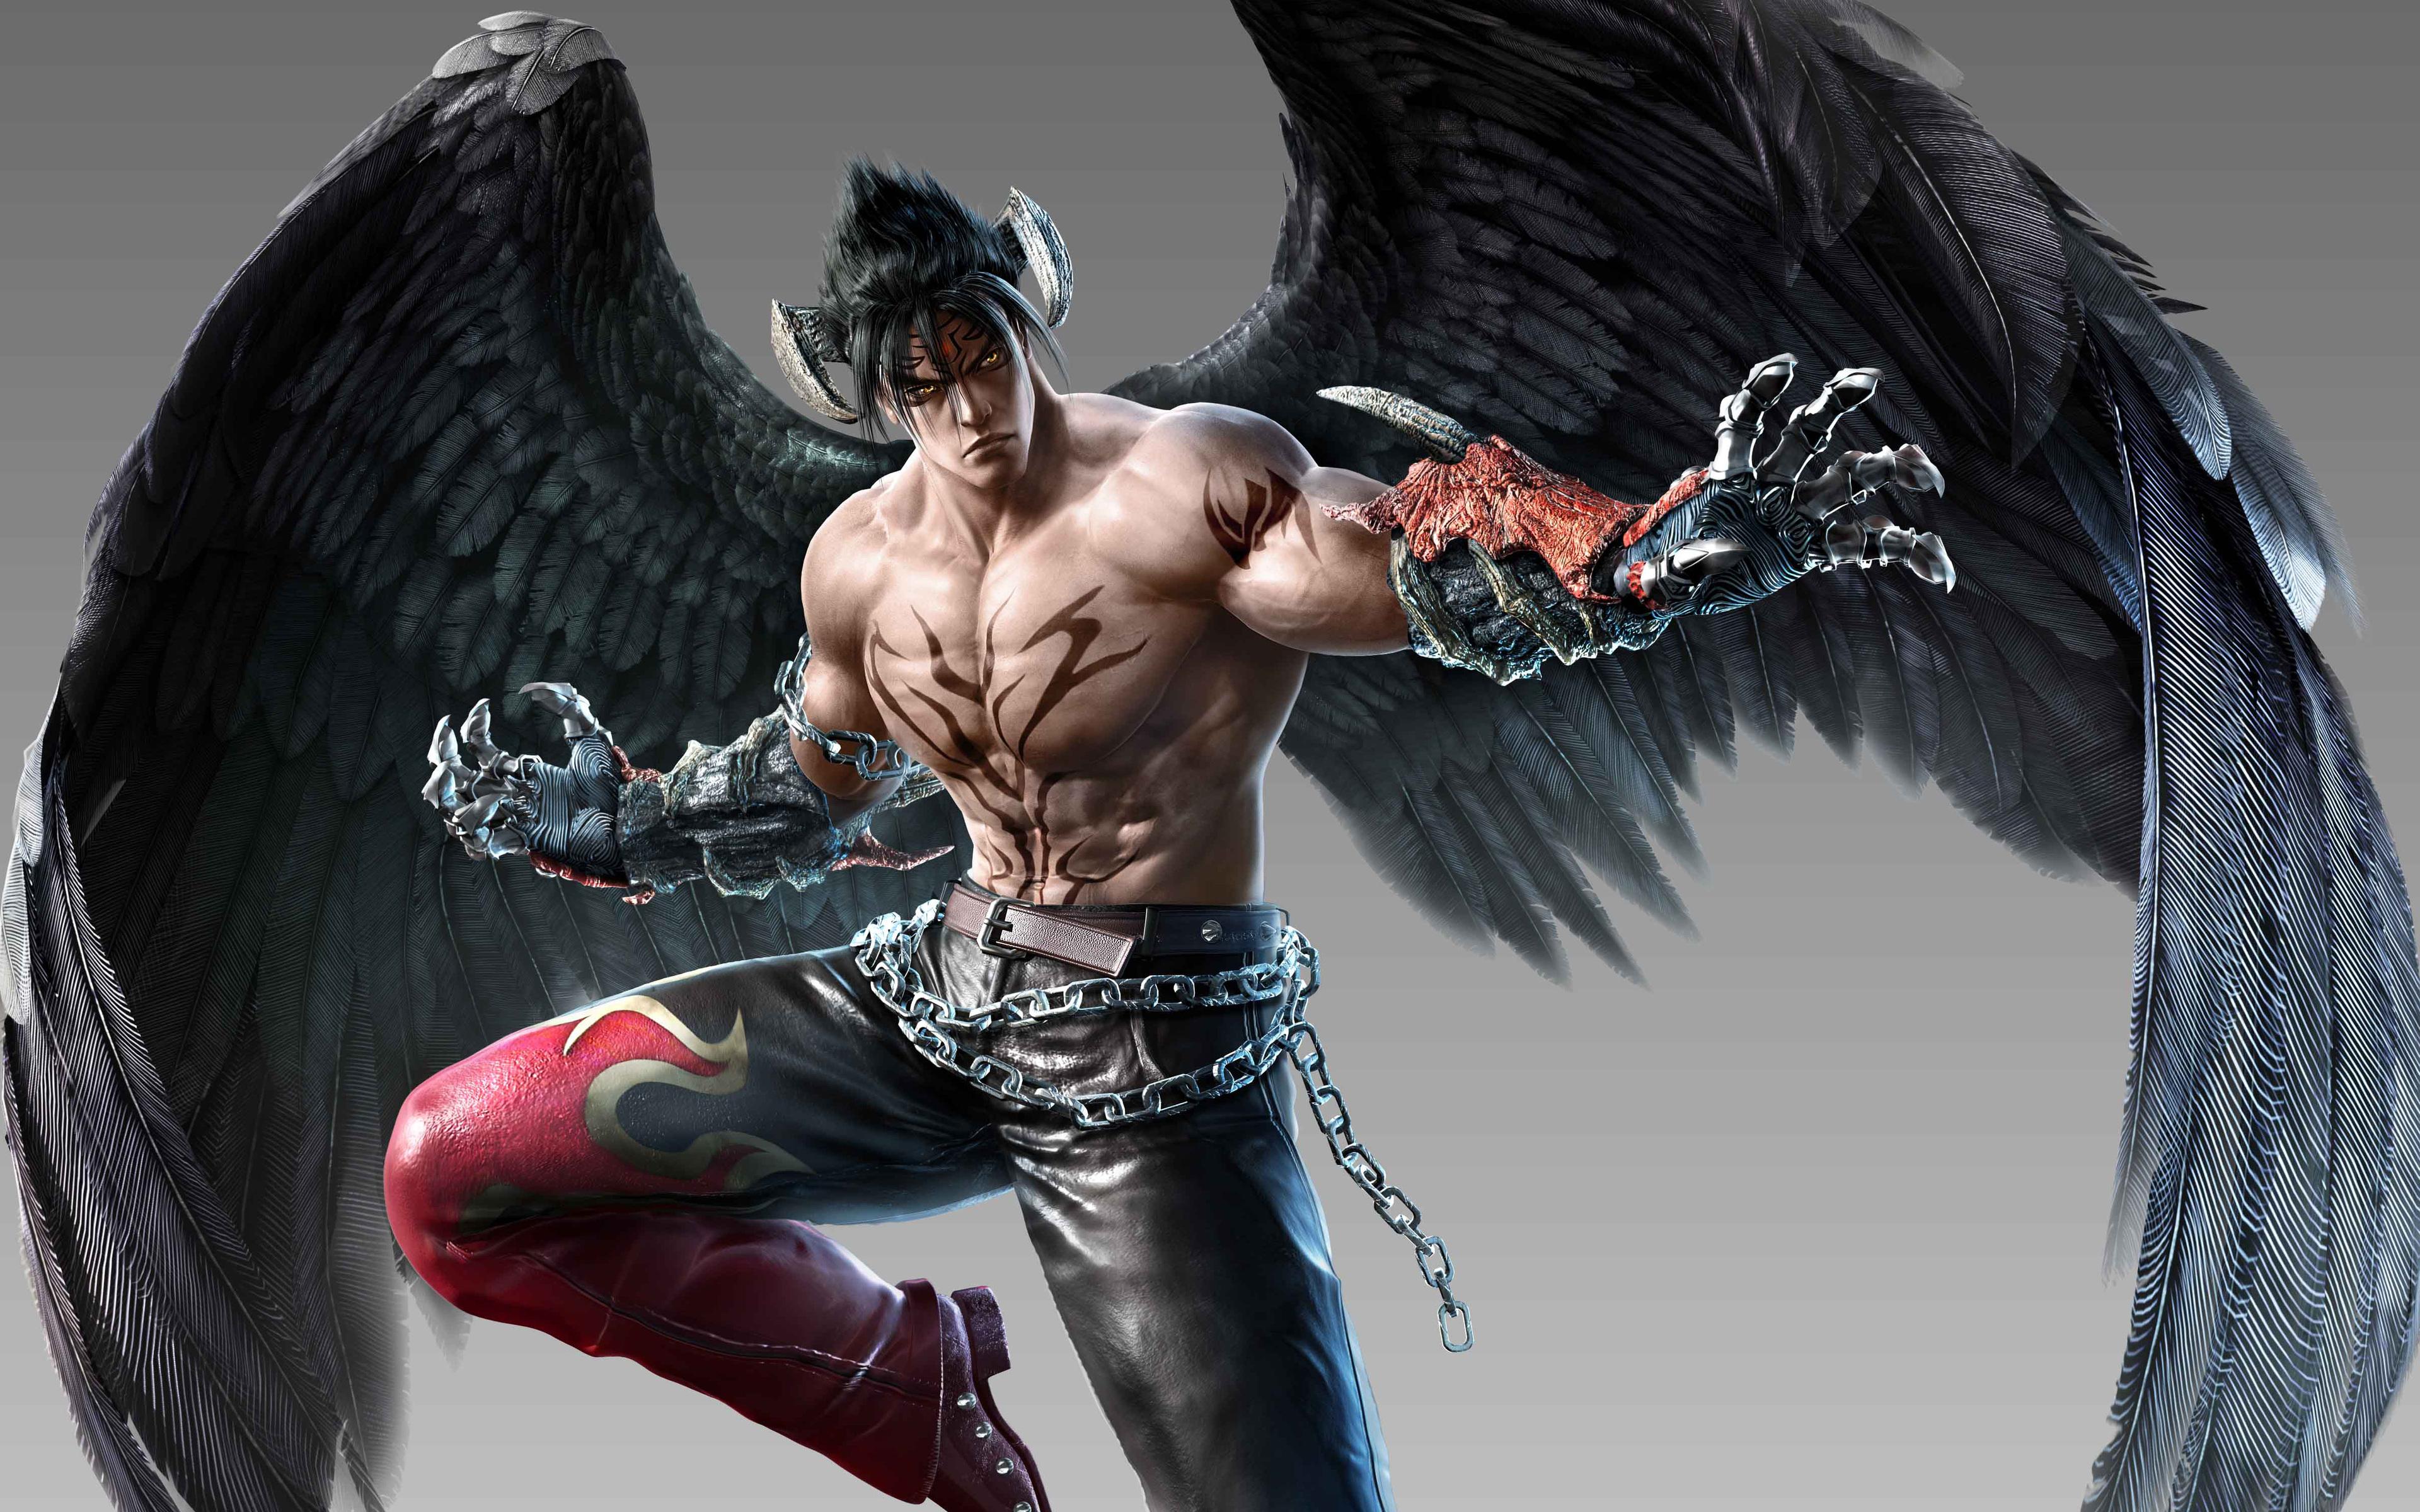 3840x2400 Jin Kazama Tekken 7 5k 4k Hd 4k Wallpapers Images